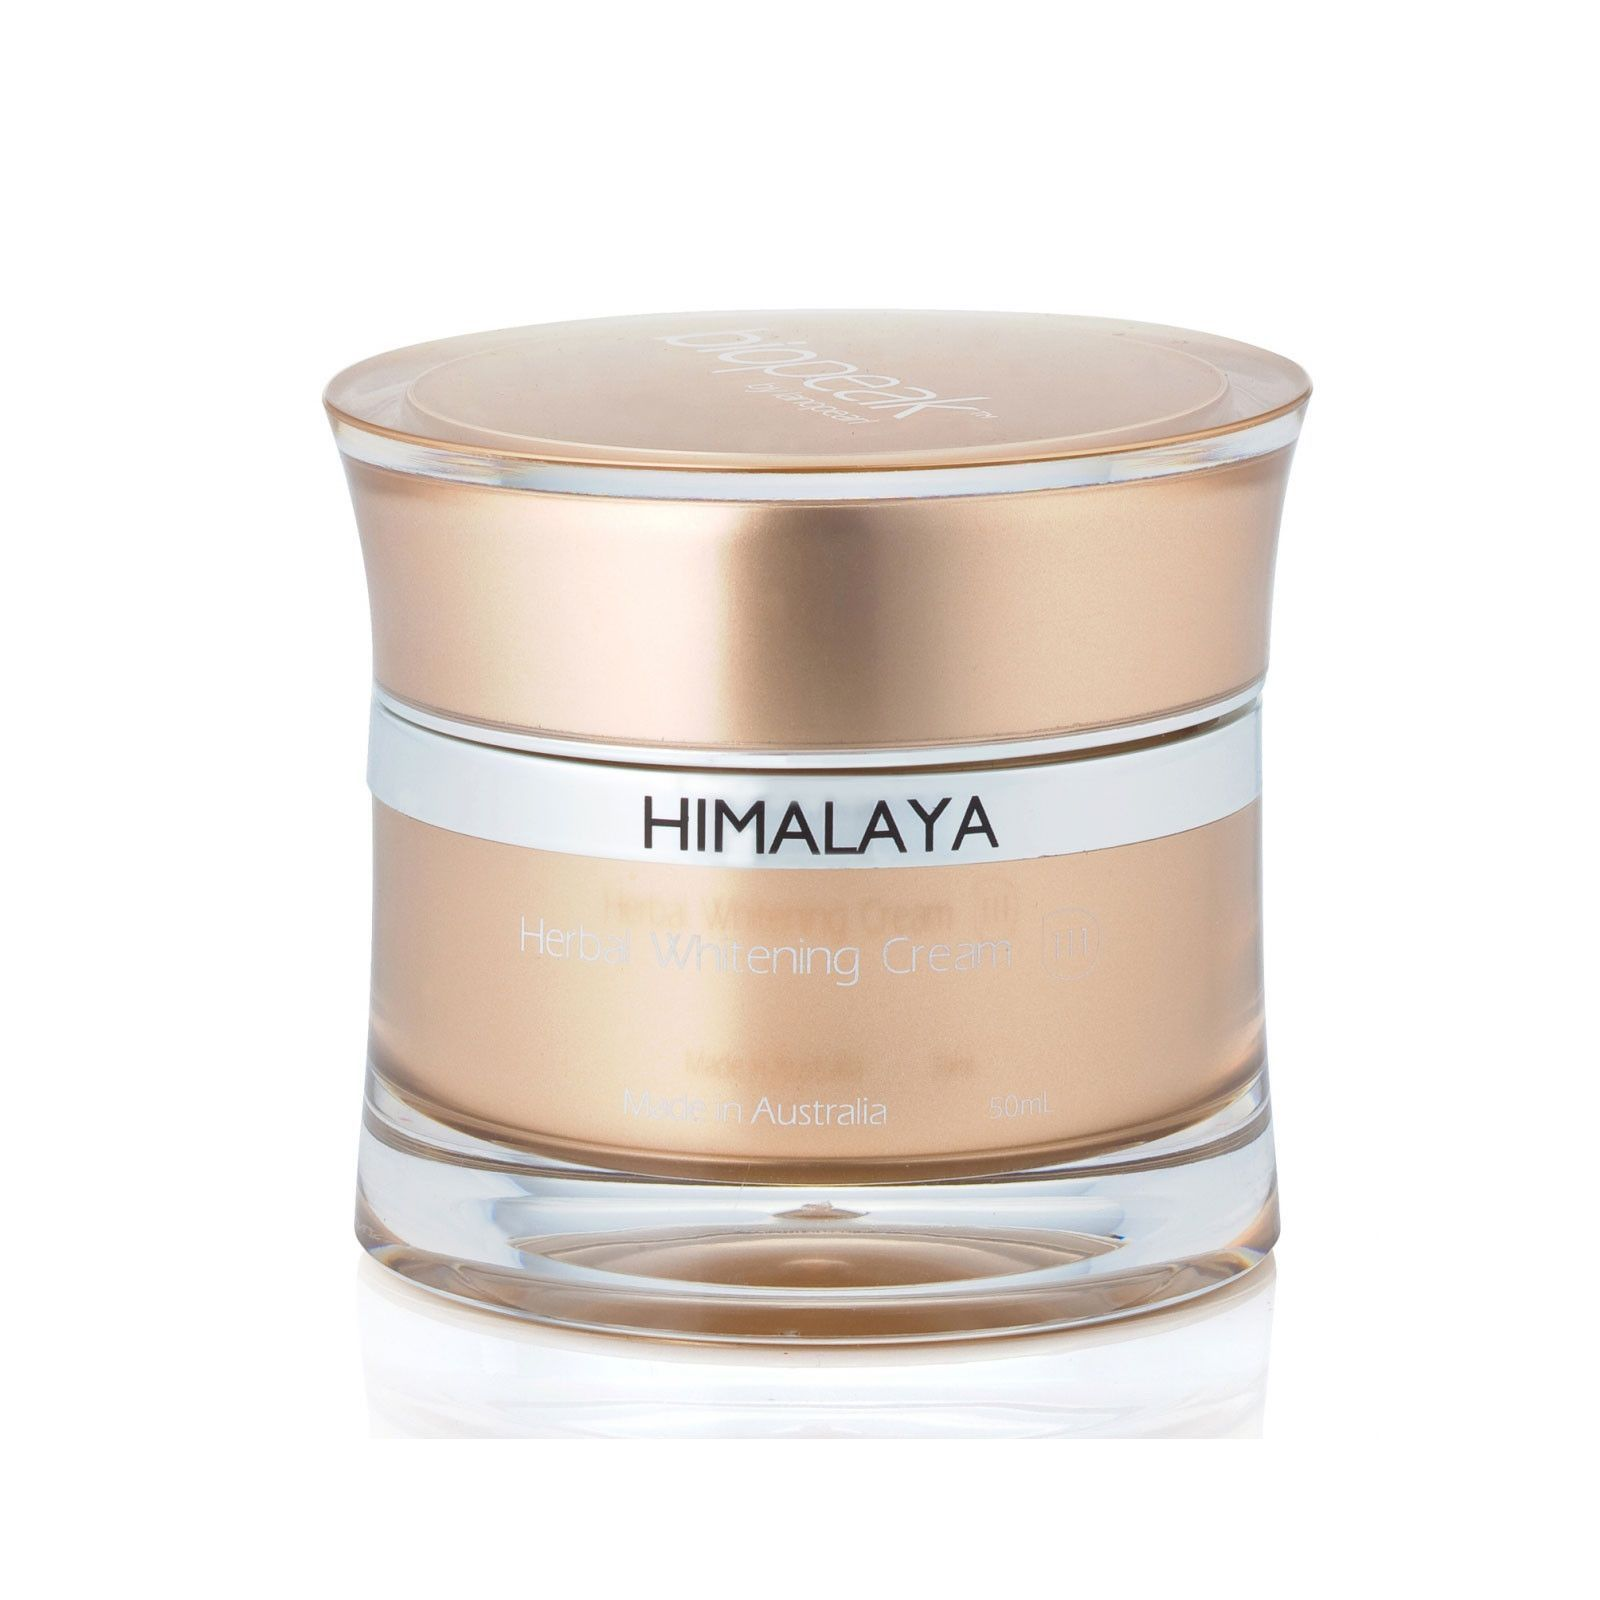 Himalaya Herbal Whitening Cream Lb34n 50ml Beauty Product Nourishing Skin